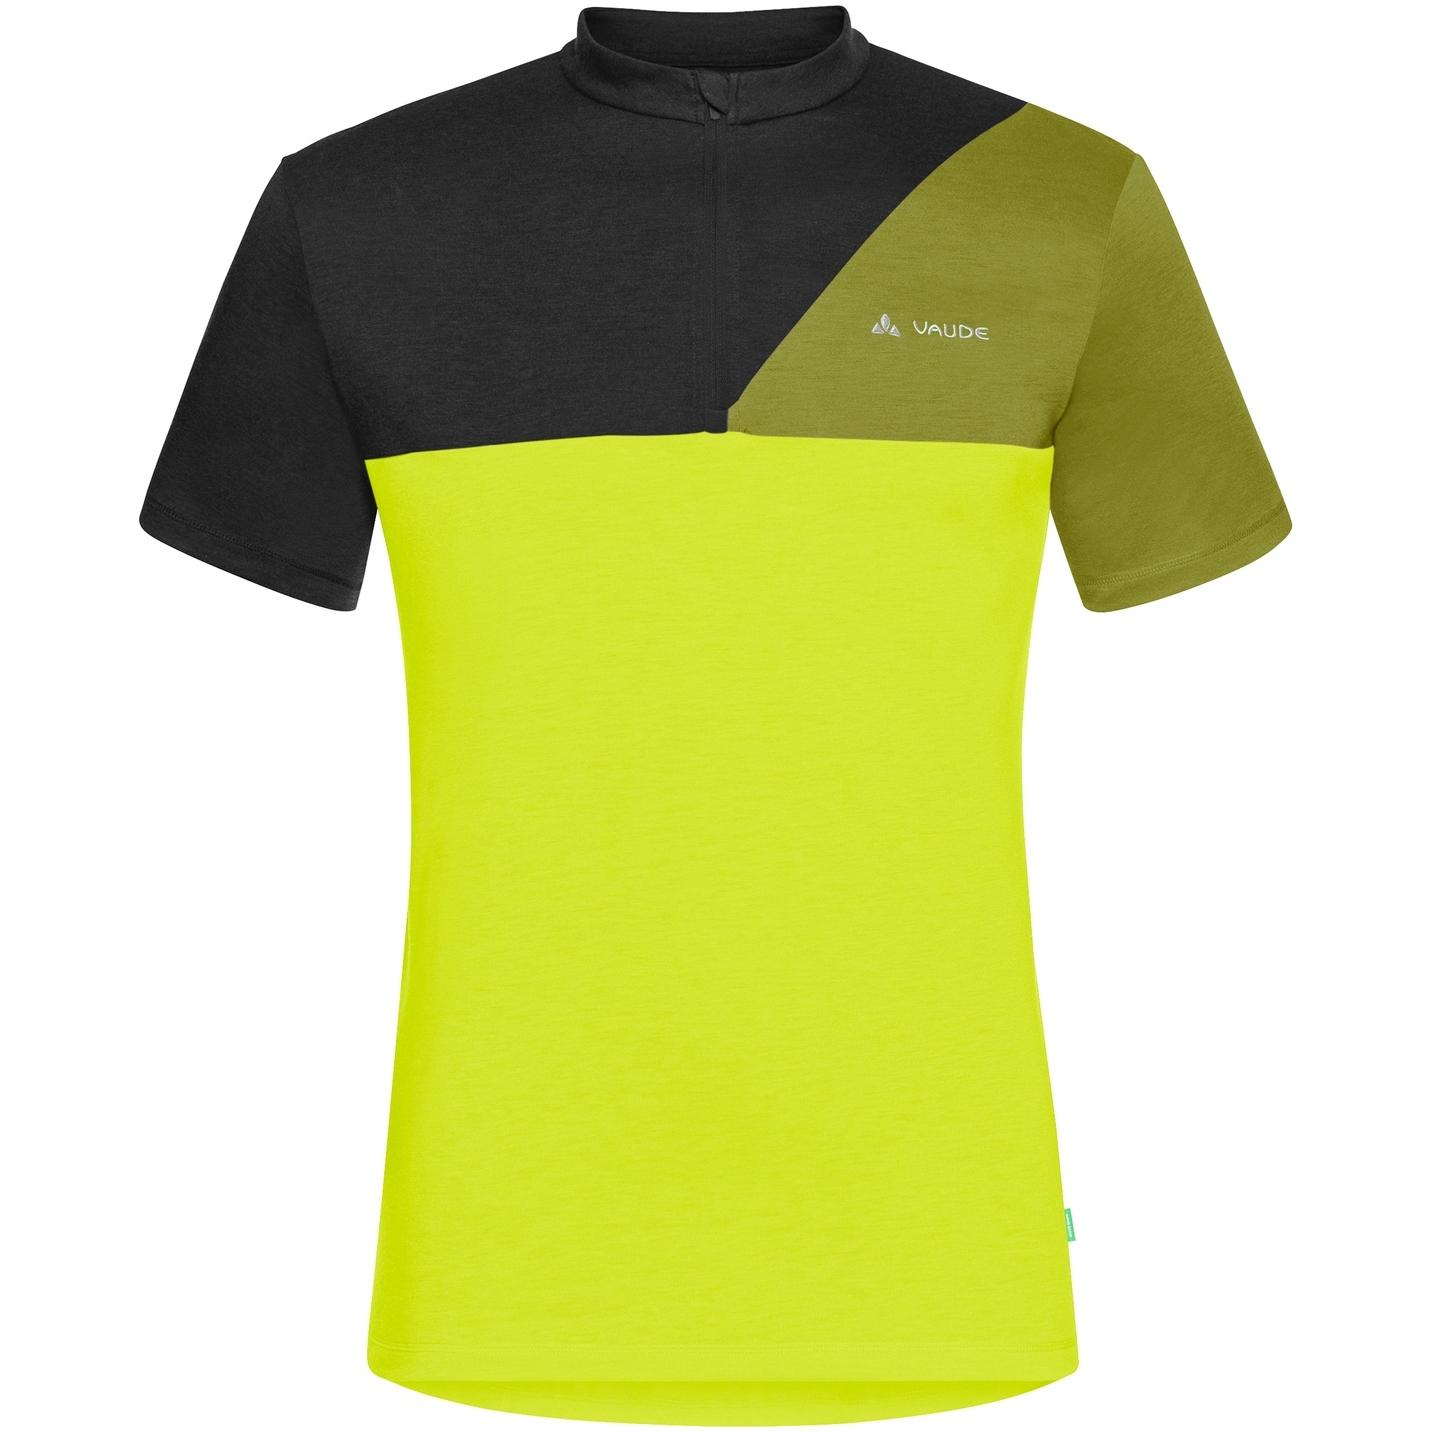 Vaude Tremalzo Shirt IV - bright green/black